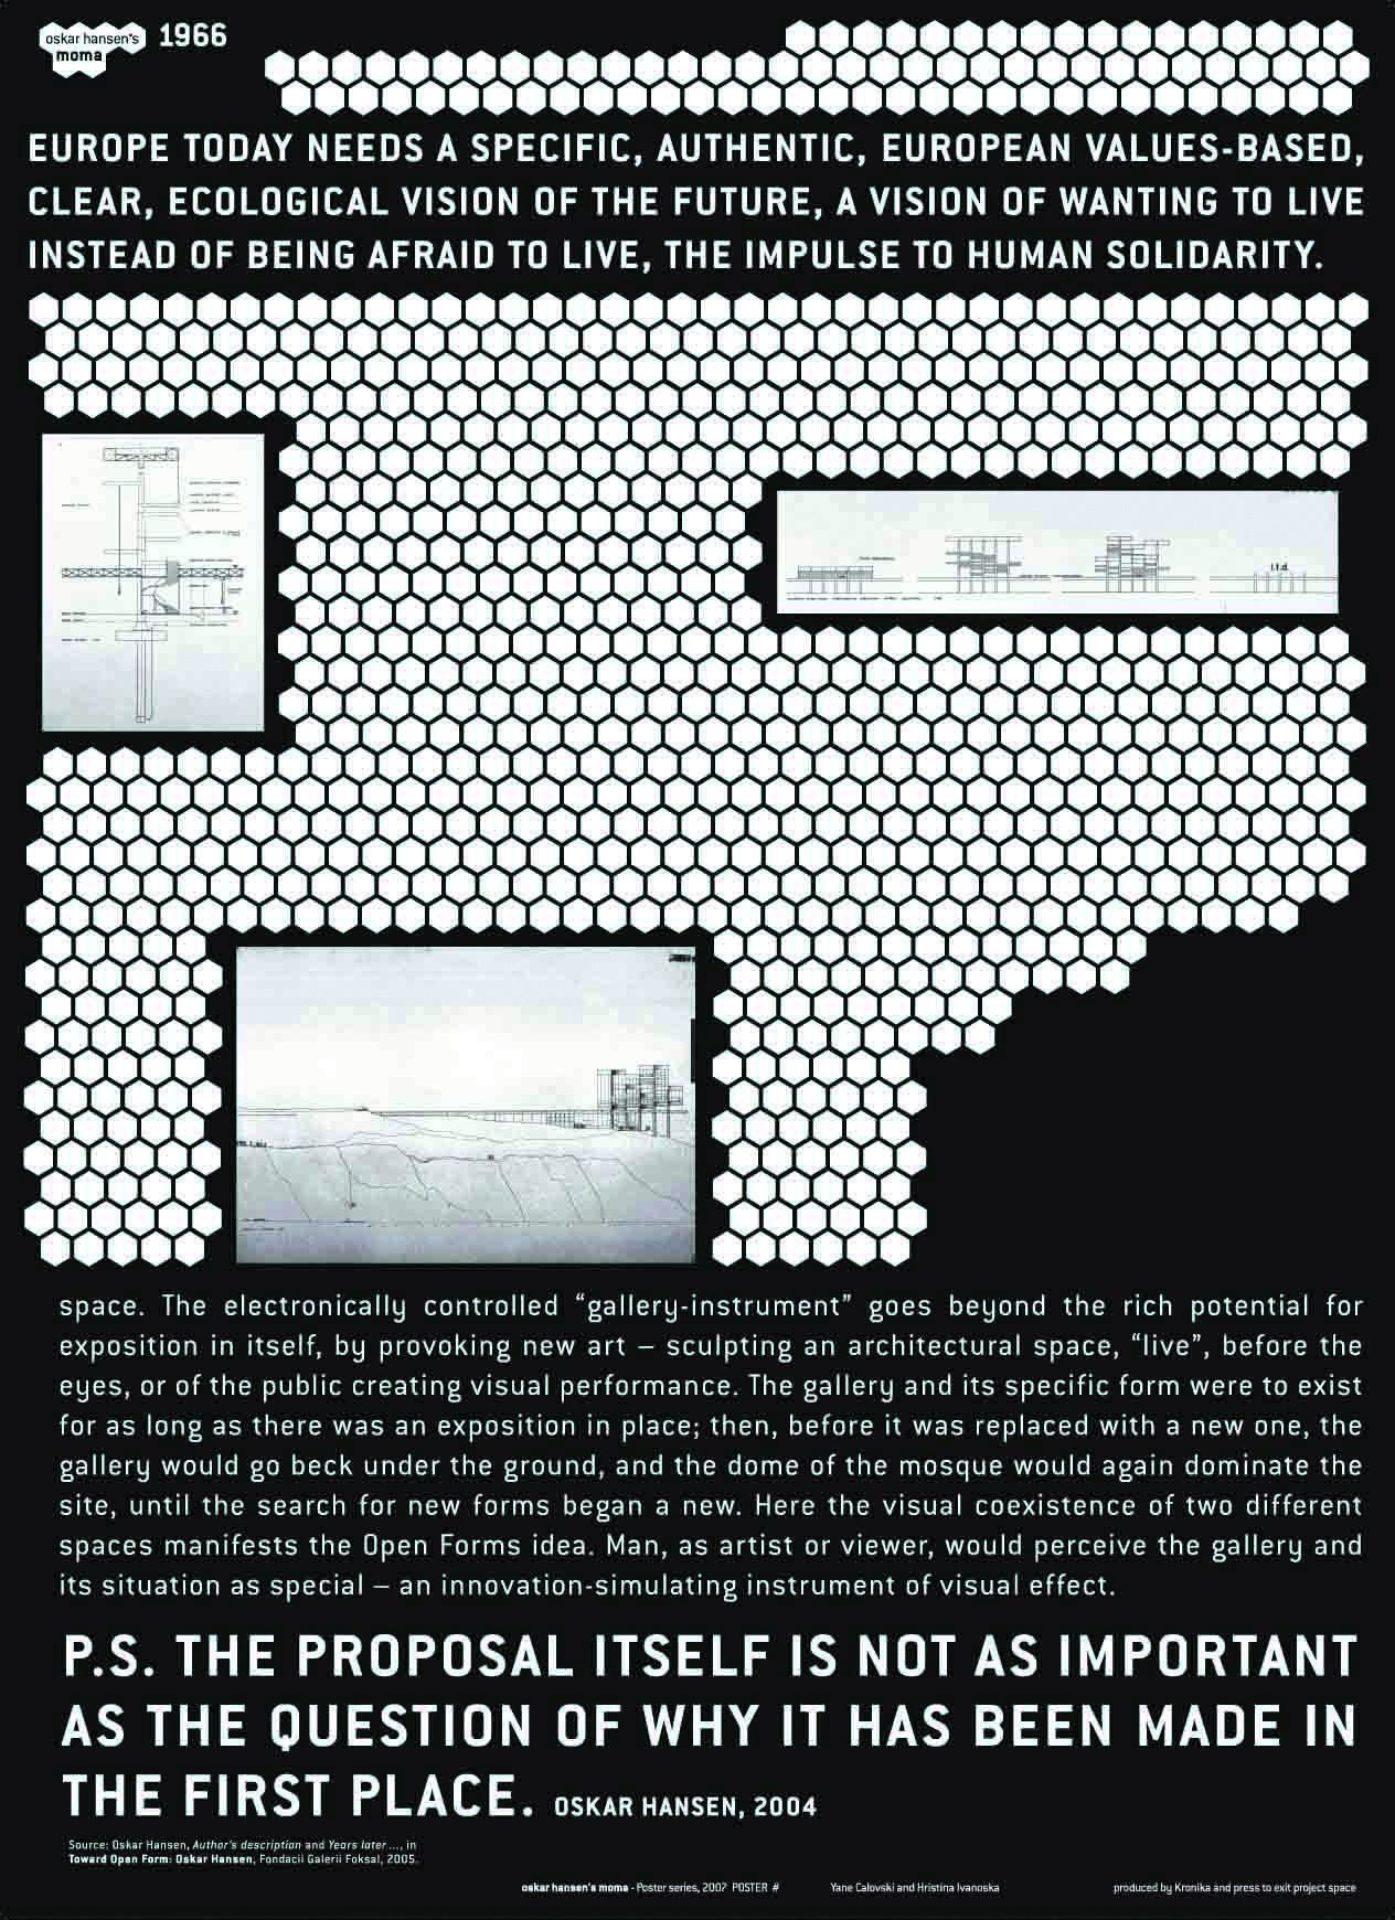 Hristina Ivanoska / Yane Calovski, The Oskar Hansen's Museum of Modern Art, 2007–2011, (4/12)